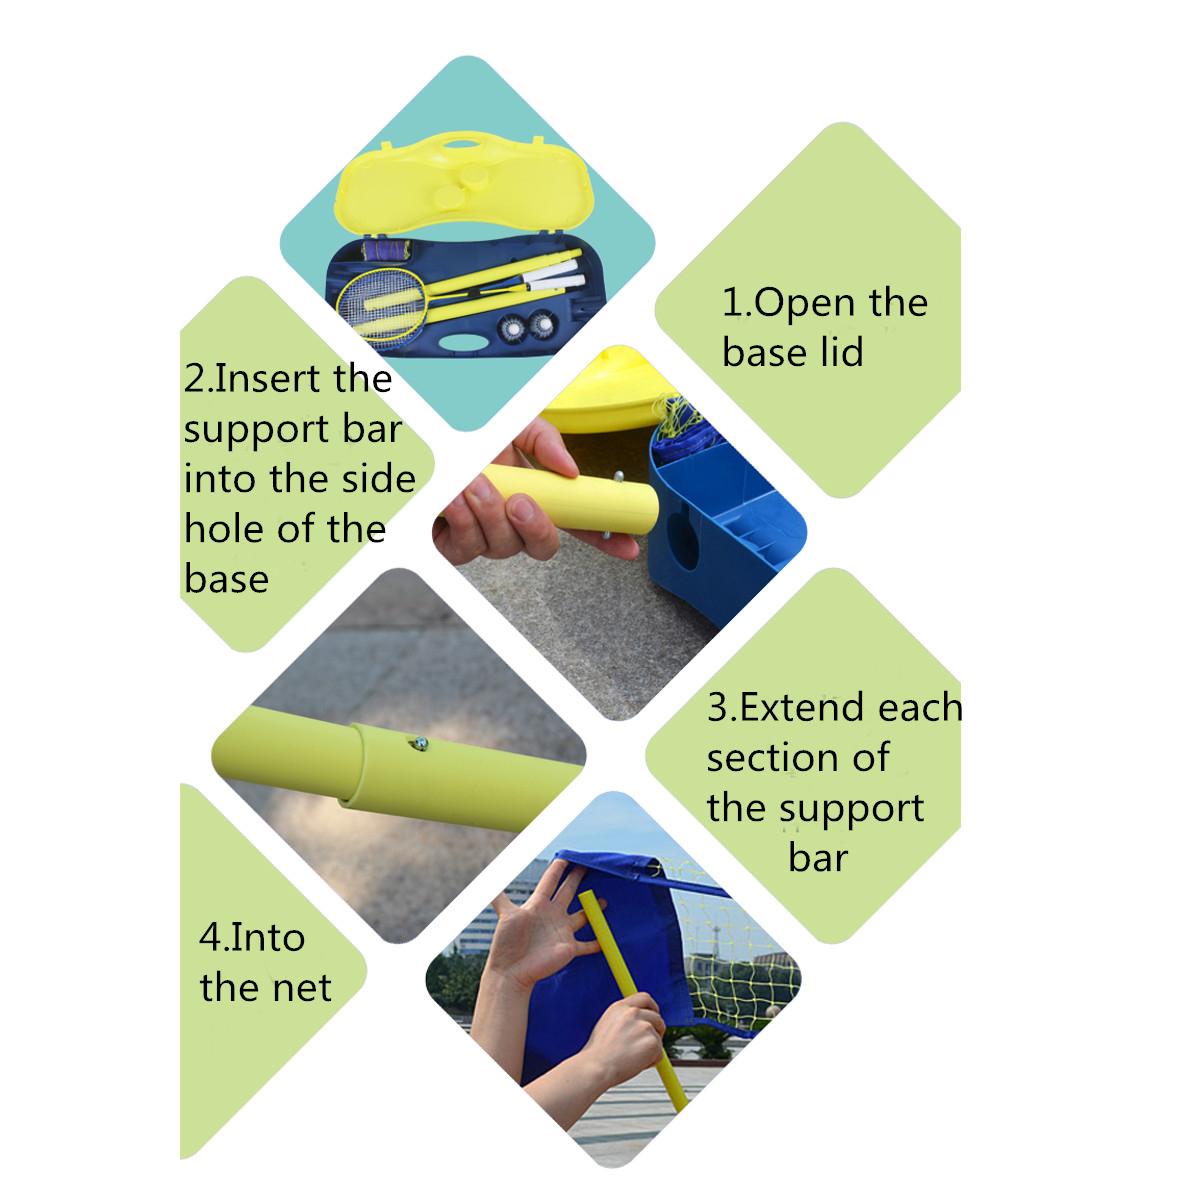 3 in 1 Outdoor Sport Badminton Tennis Volleyball Net Portable Stand Battledore Set